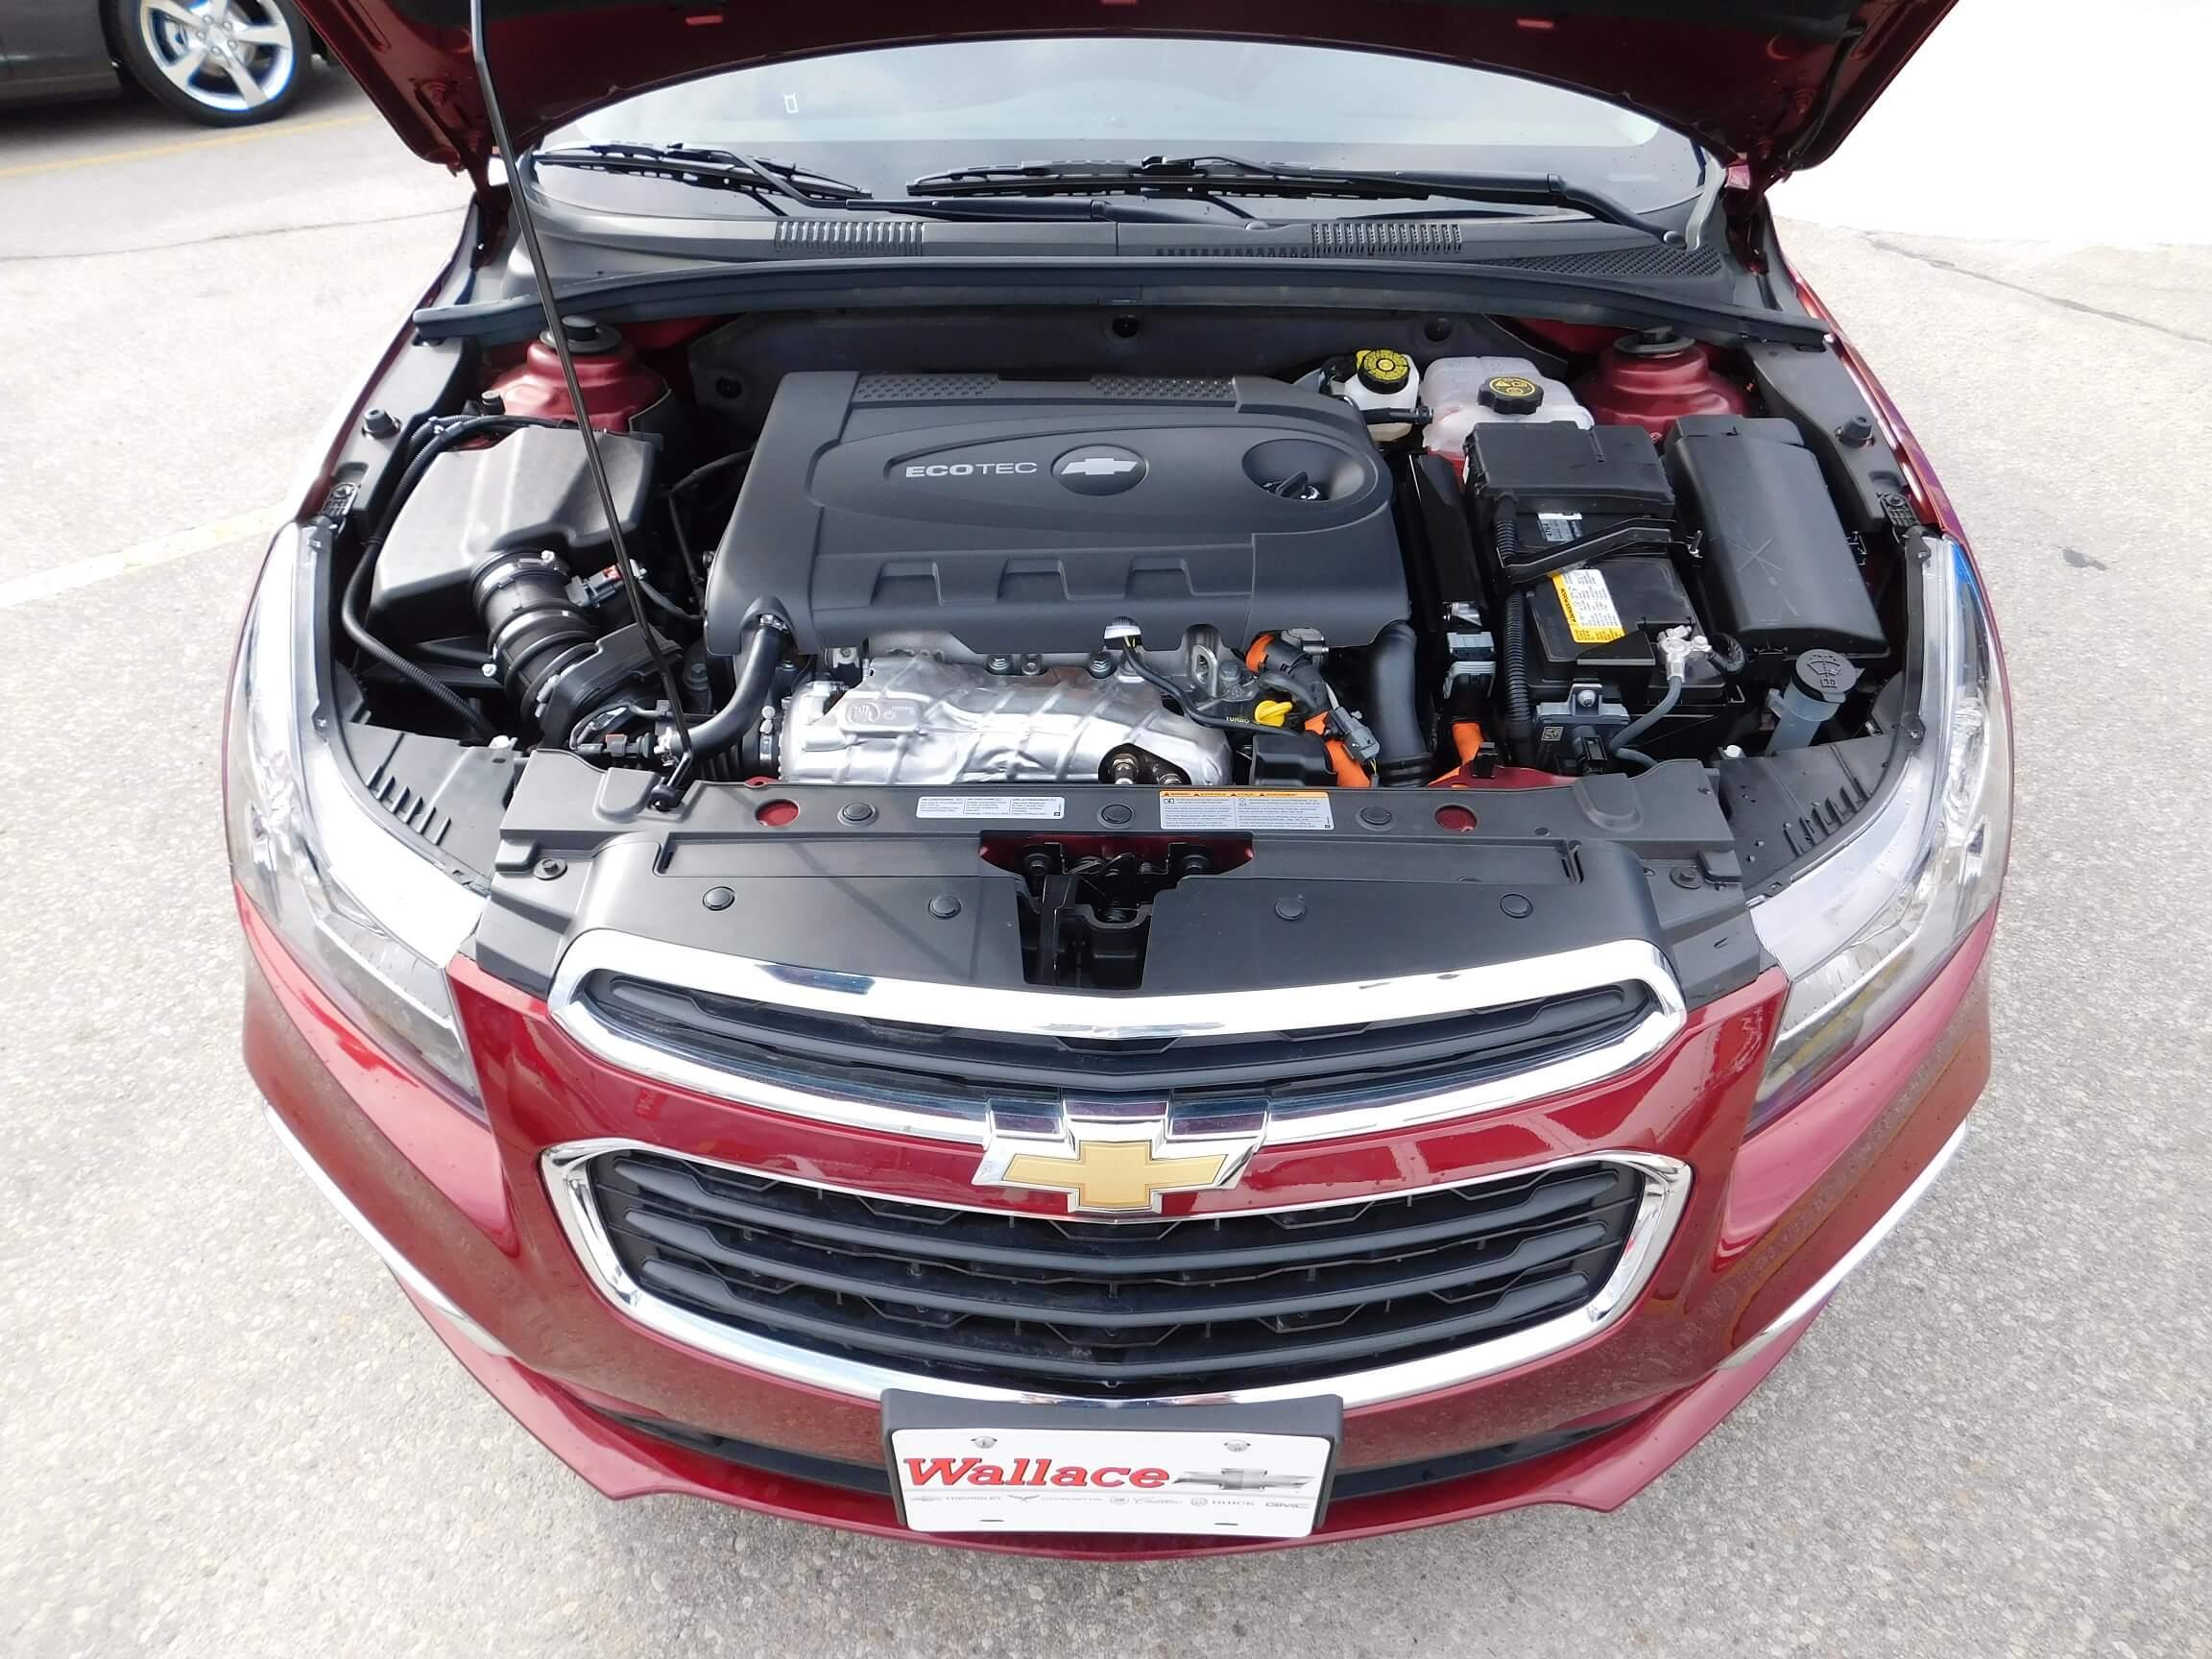 2015 Chevrolet Cruze Diesel Specs Gm Ecotec Engine 20l Turbo